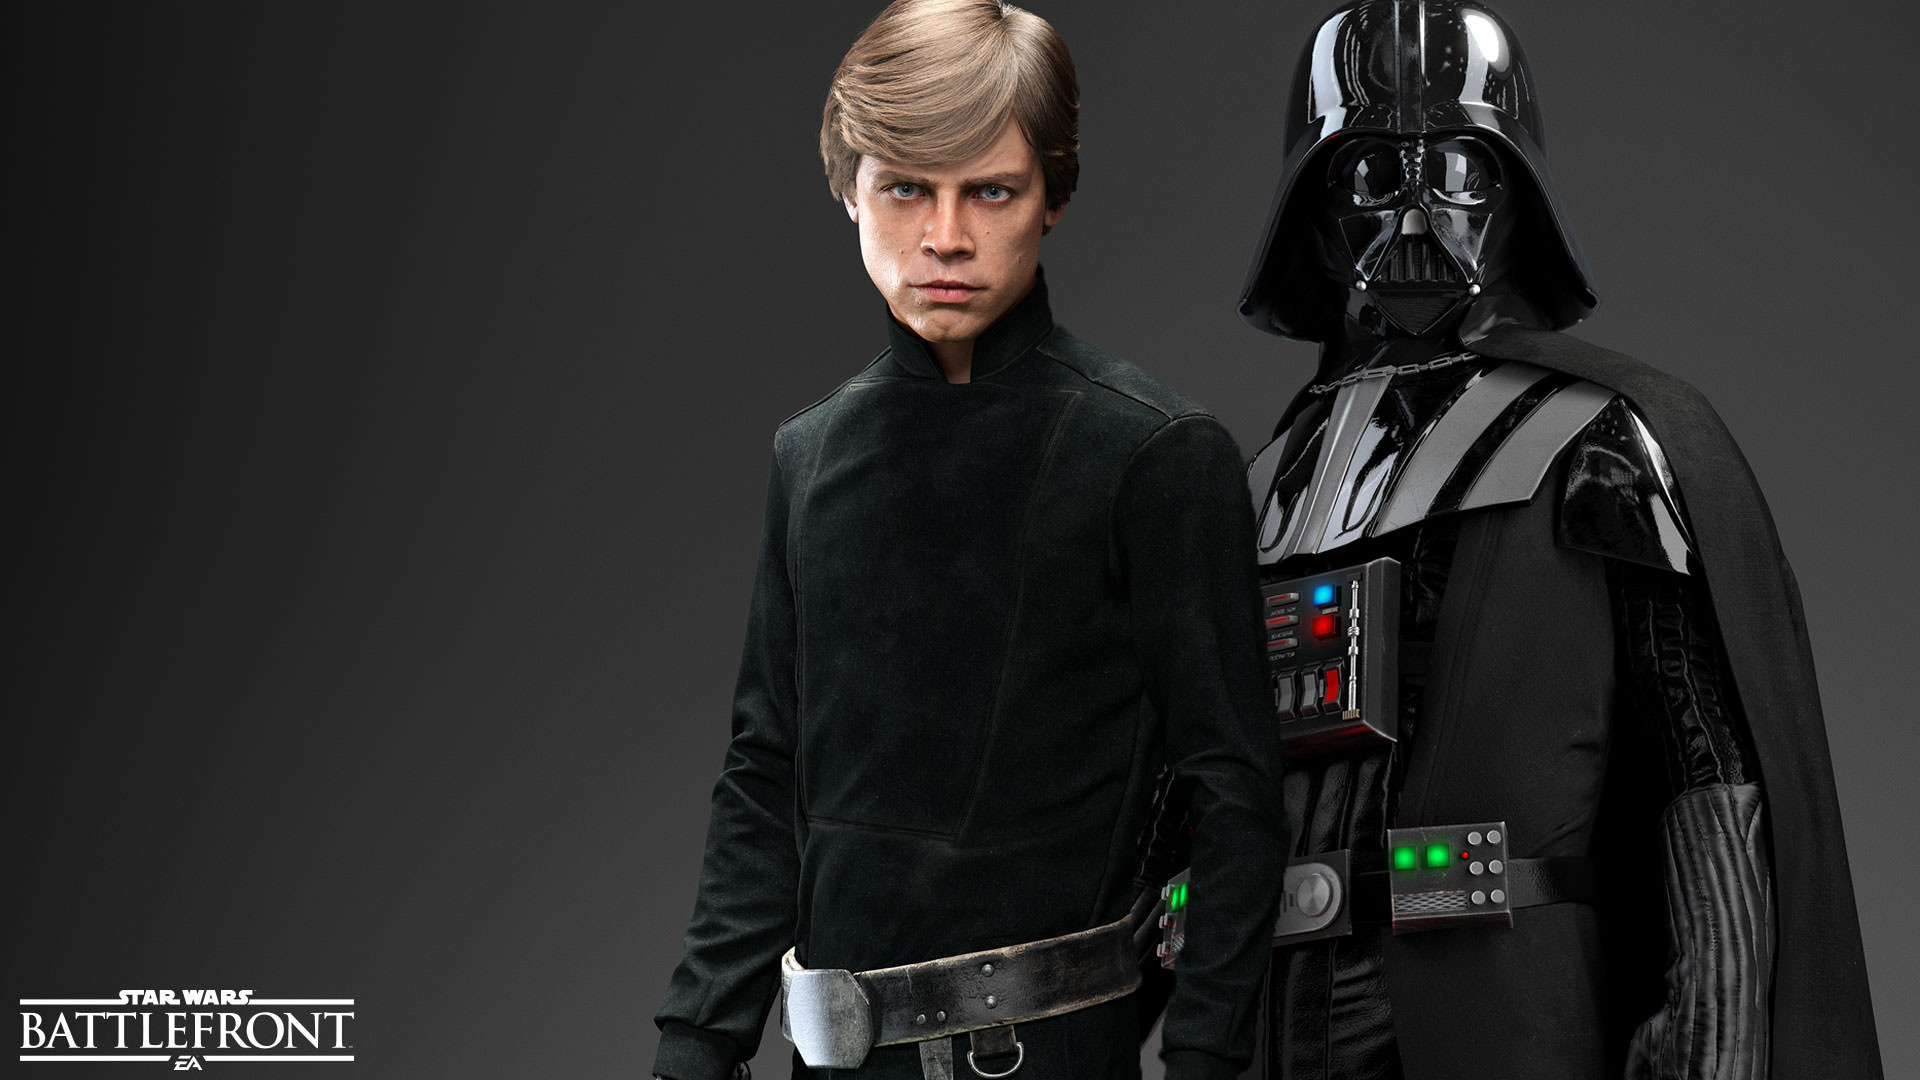 1920x1080 Anakin Skywalker Wallpaper 165537